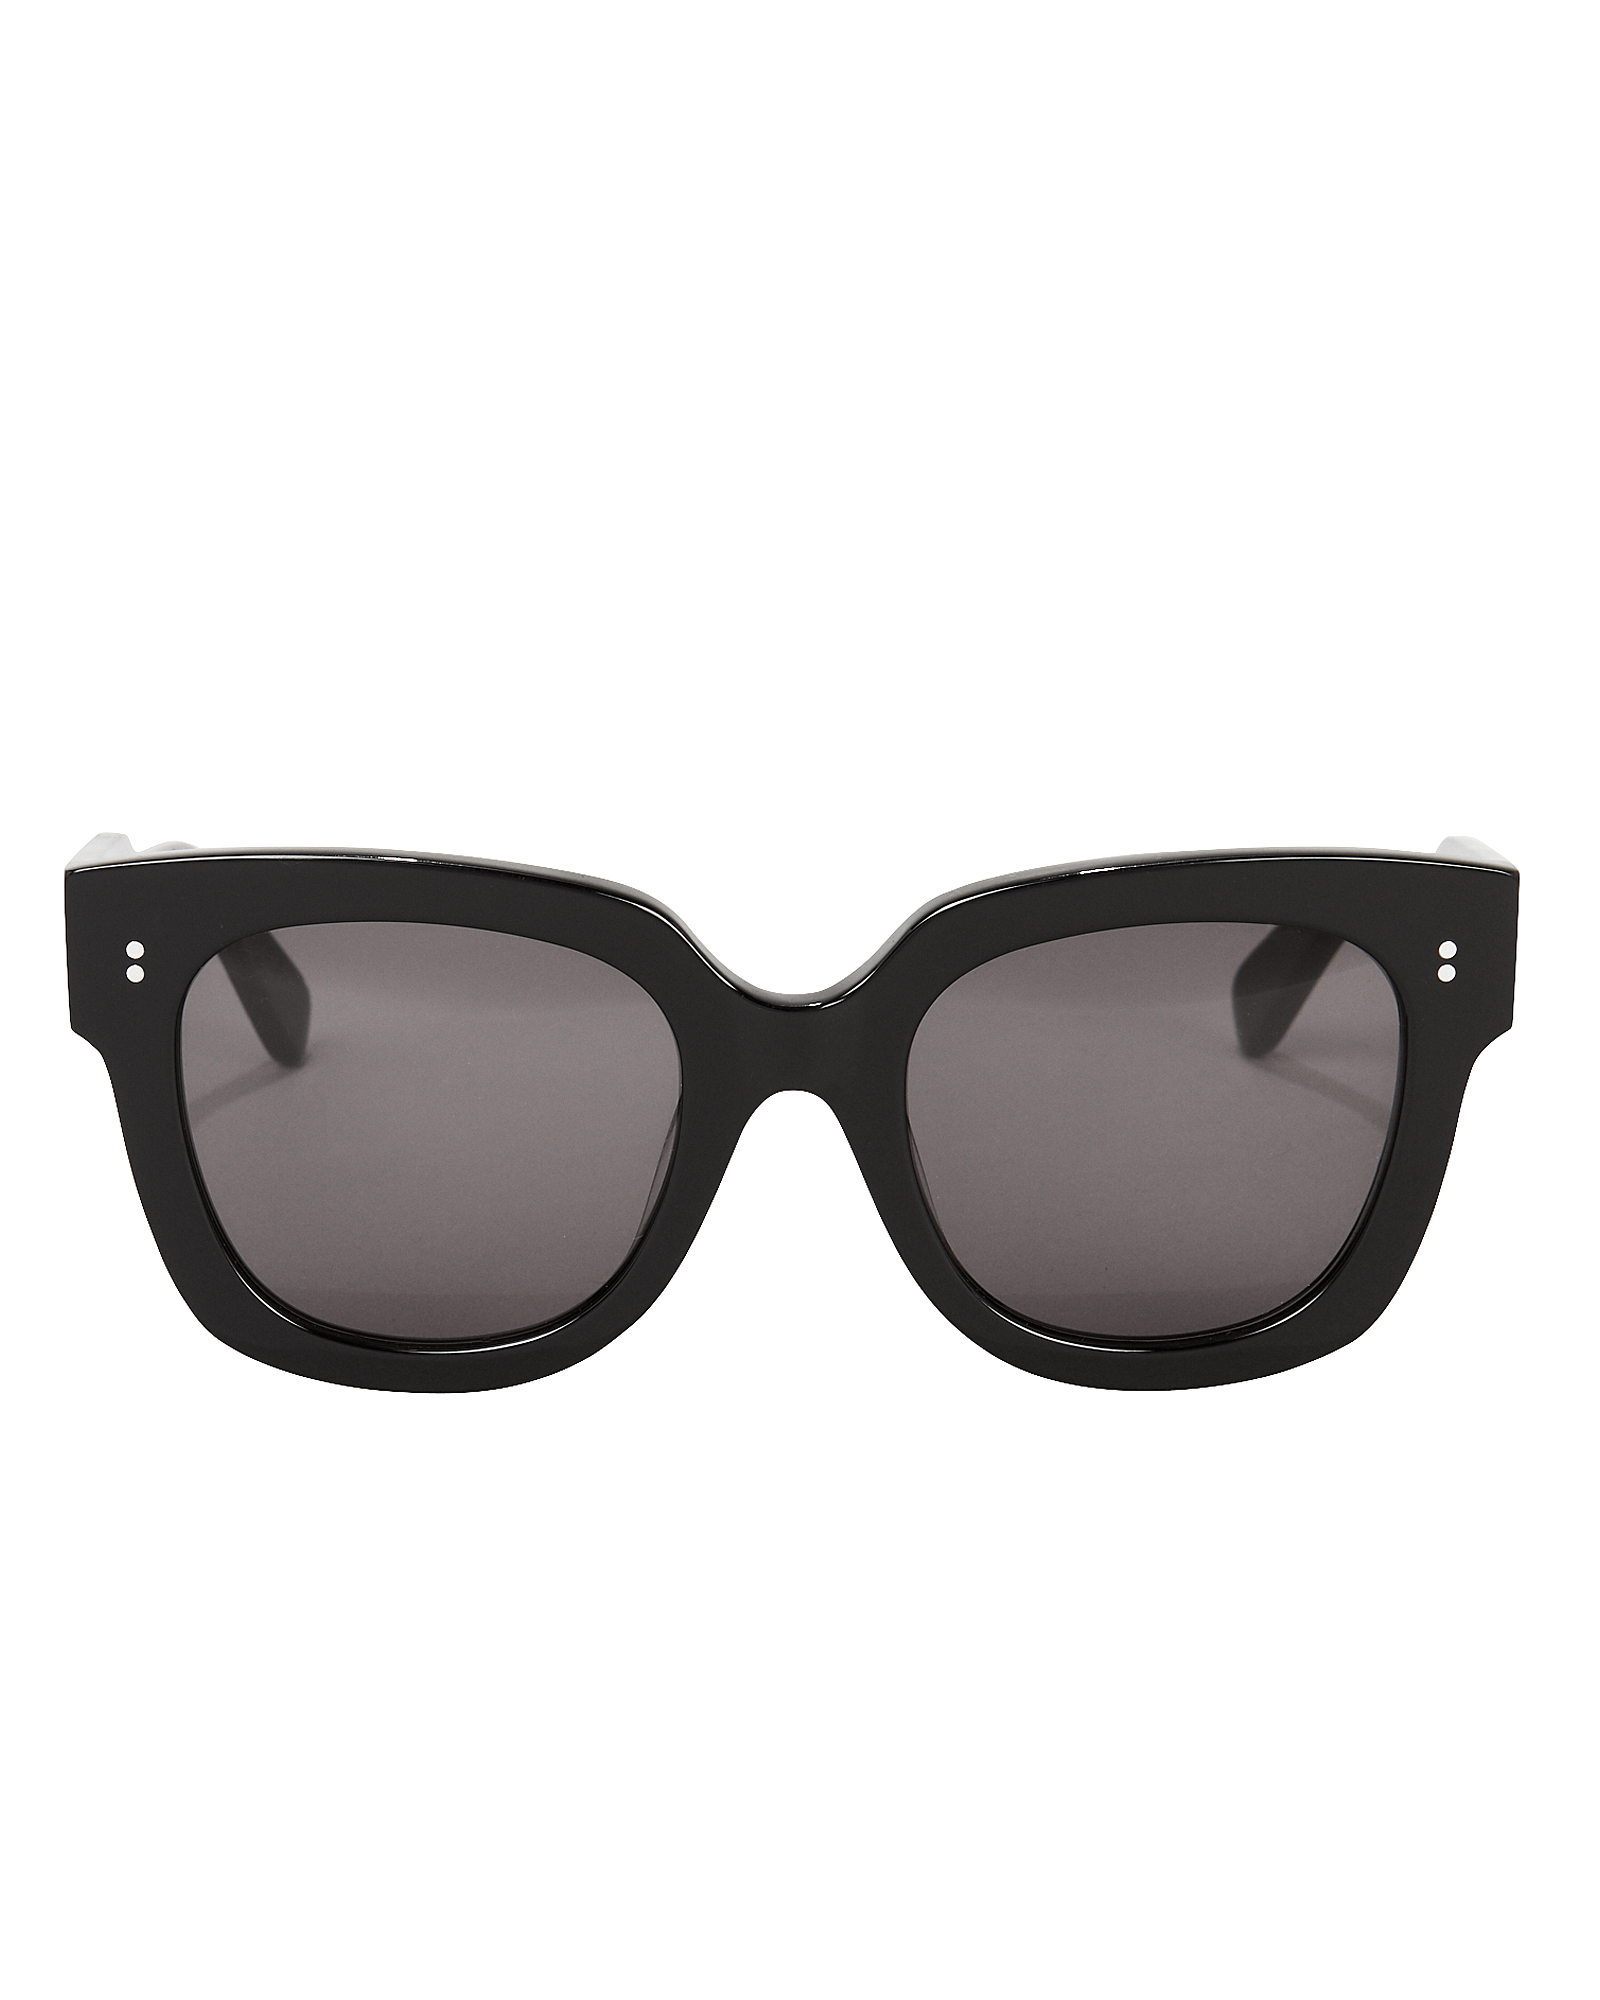 CHIMI EYEWEAR 008 Berry Sunglasses